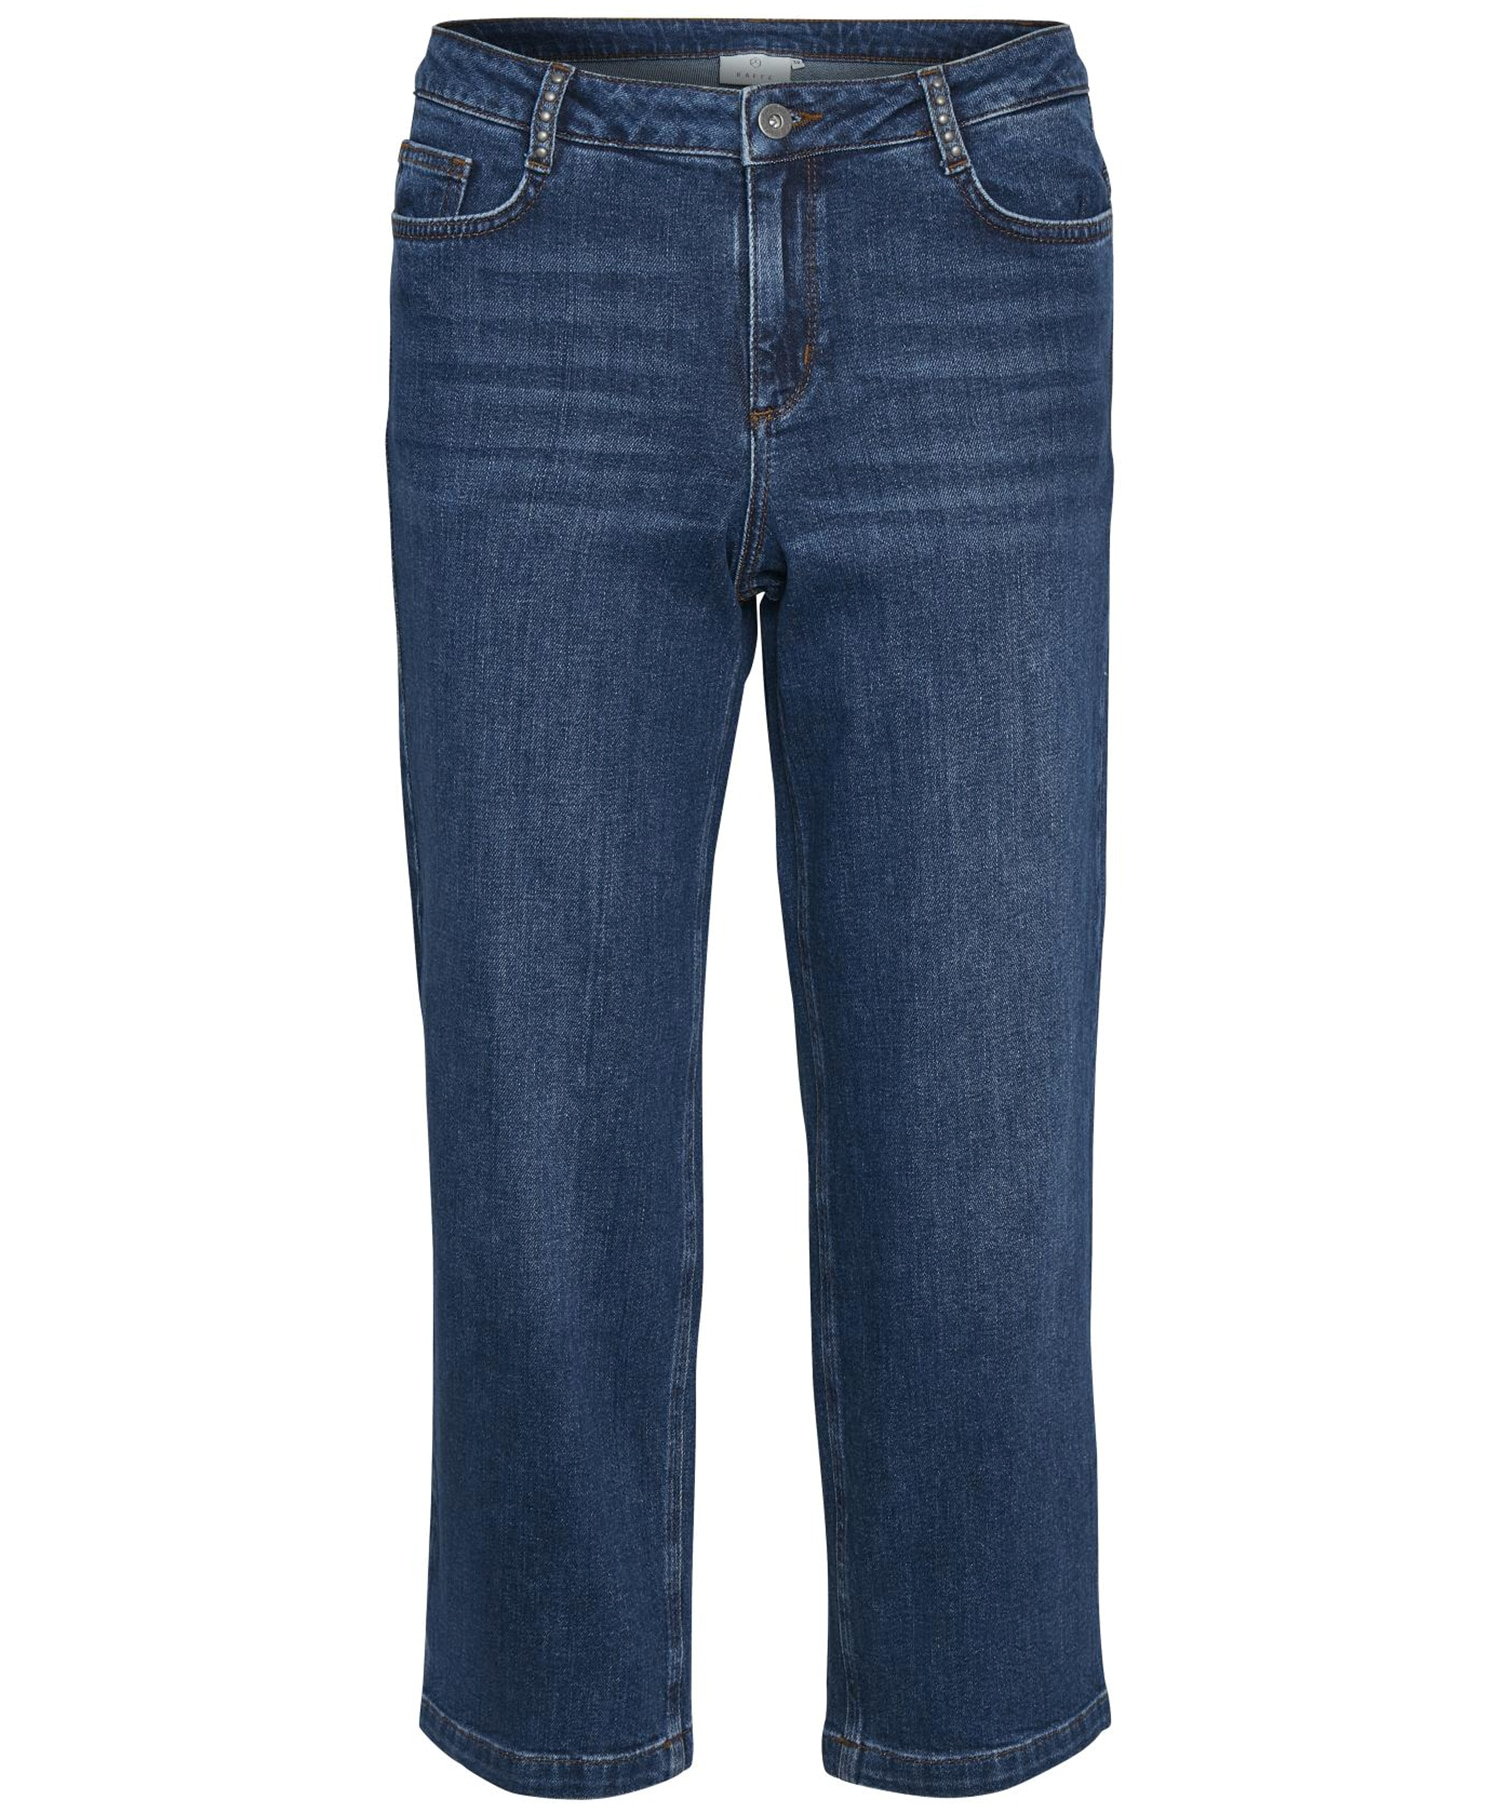 Kaffe Kajsa cropped jeans